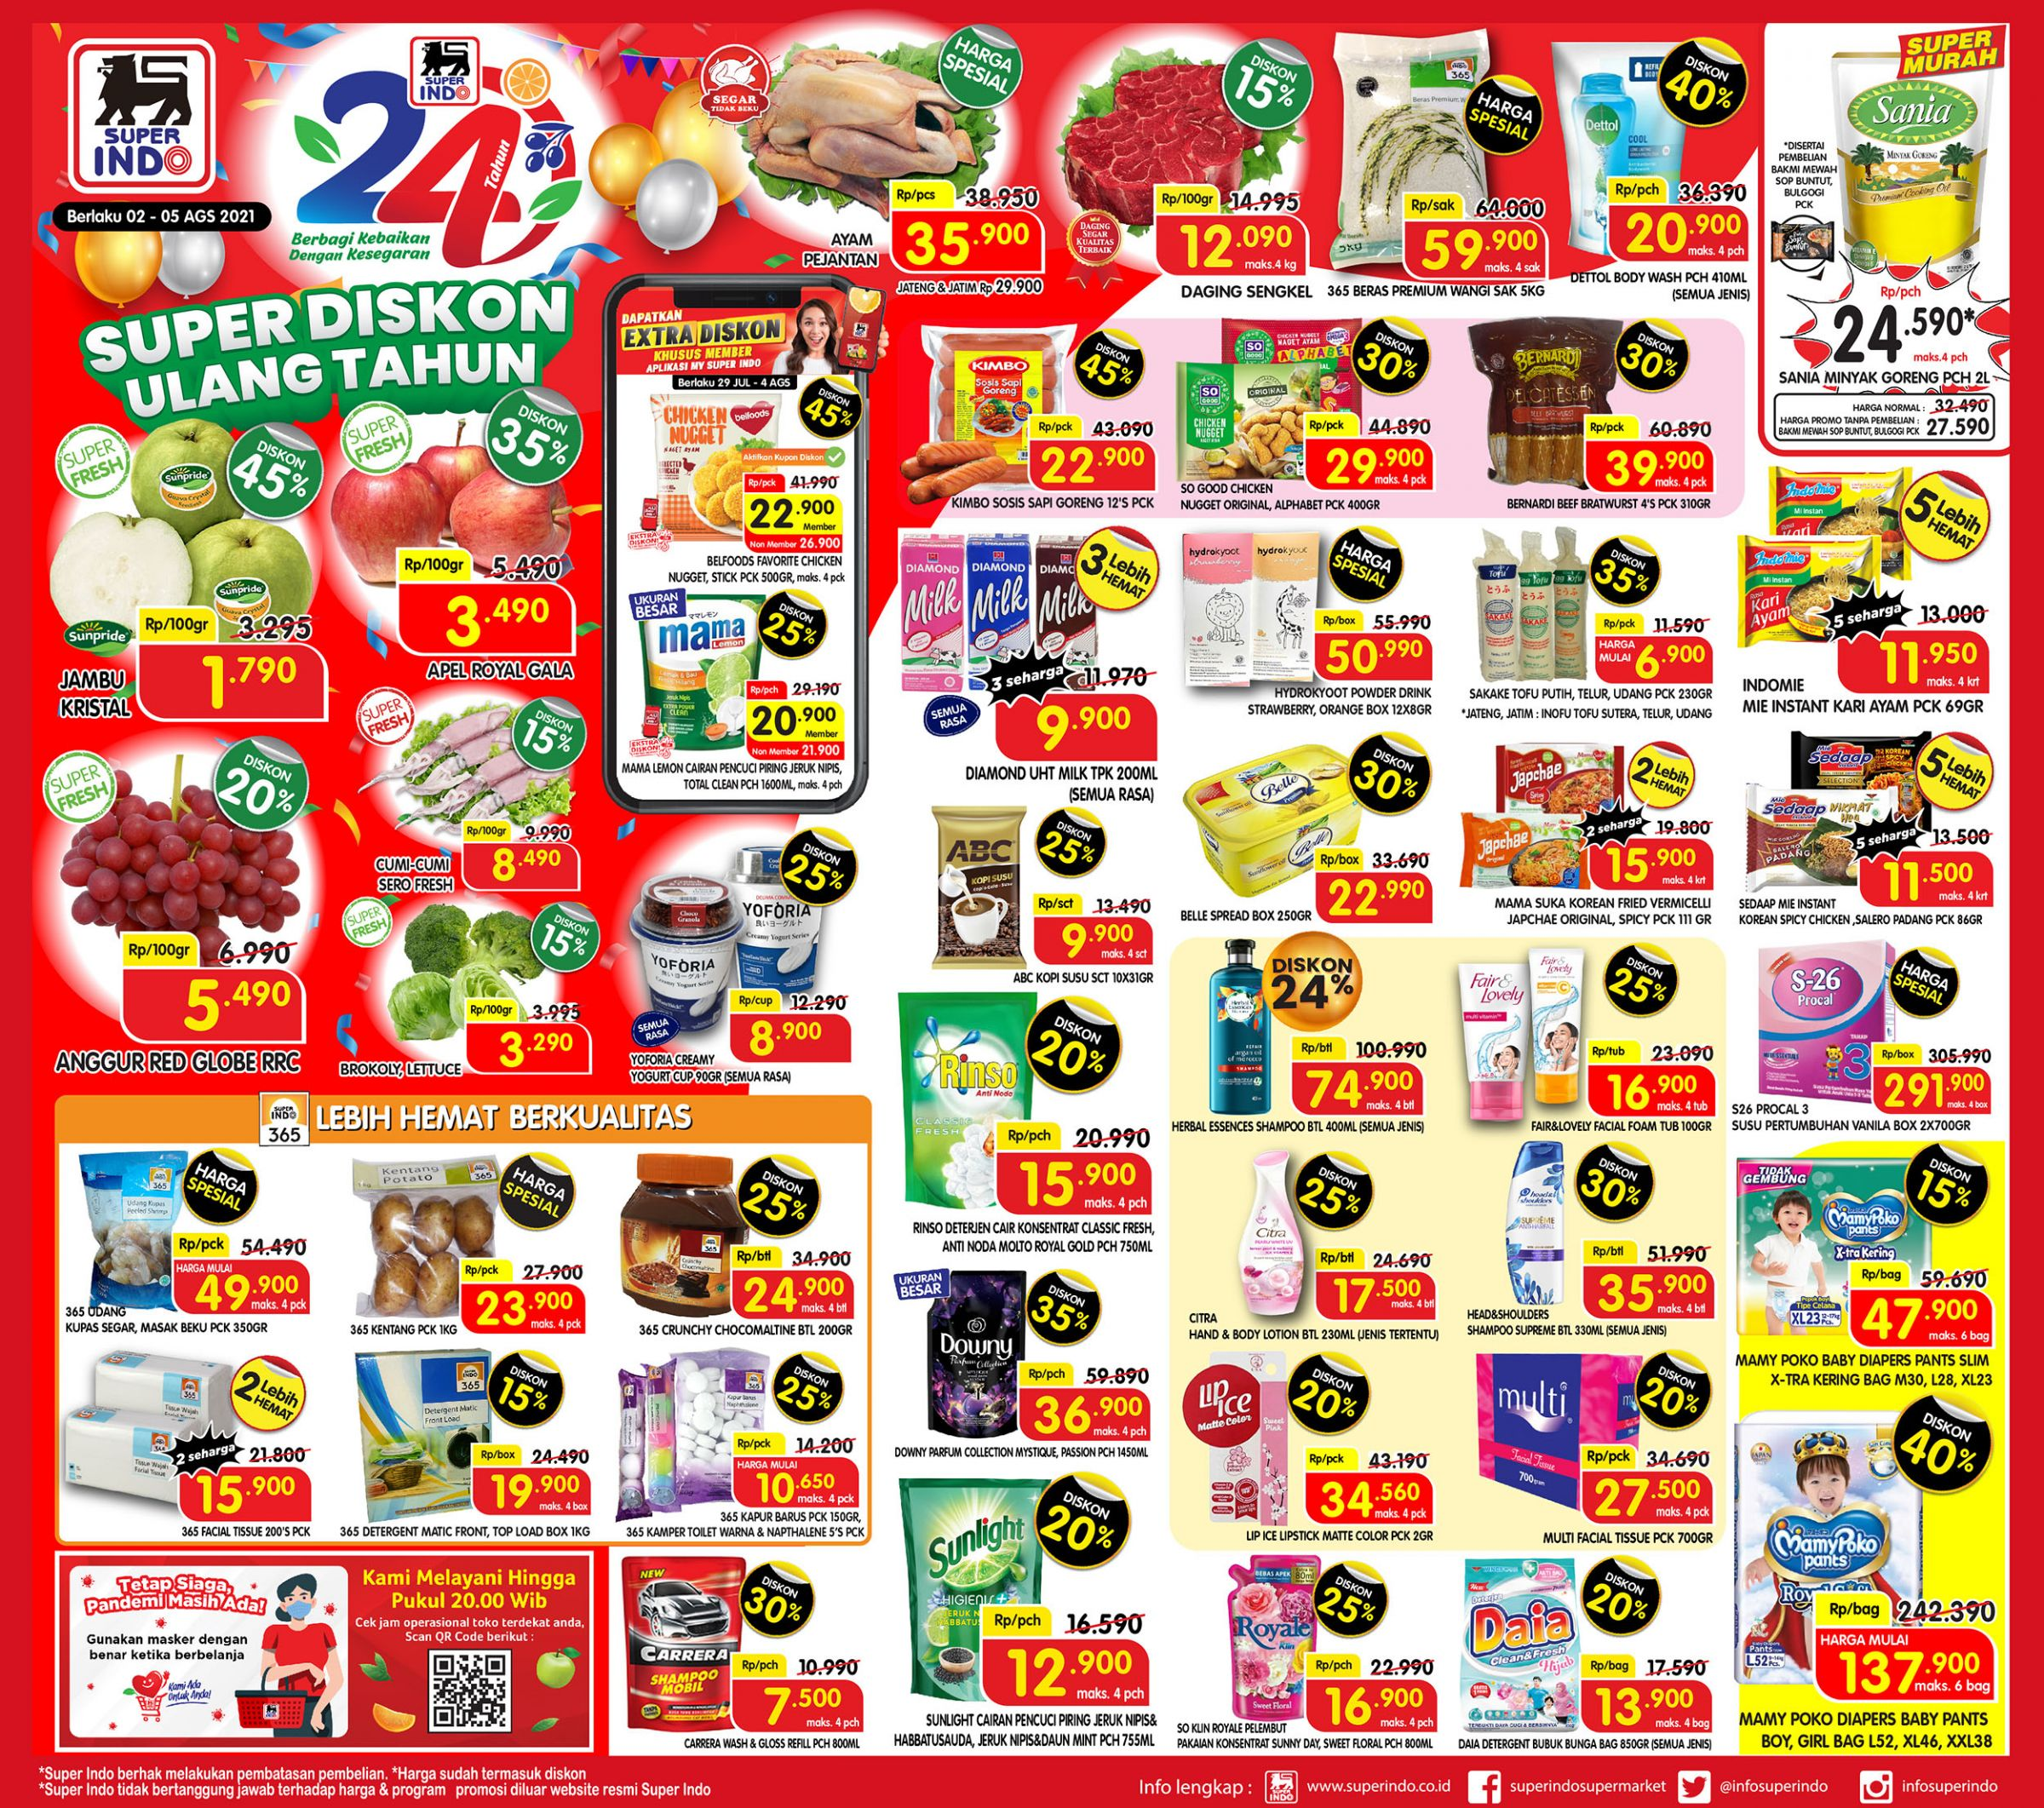 Promo Superindo Katalog Awal Pekan (Weekday) periode 02-05 Agustus 2021